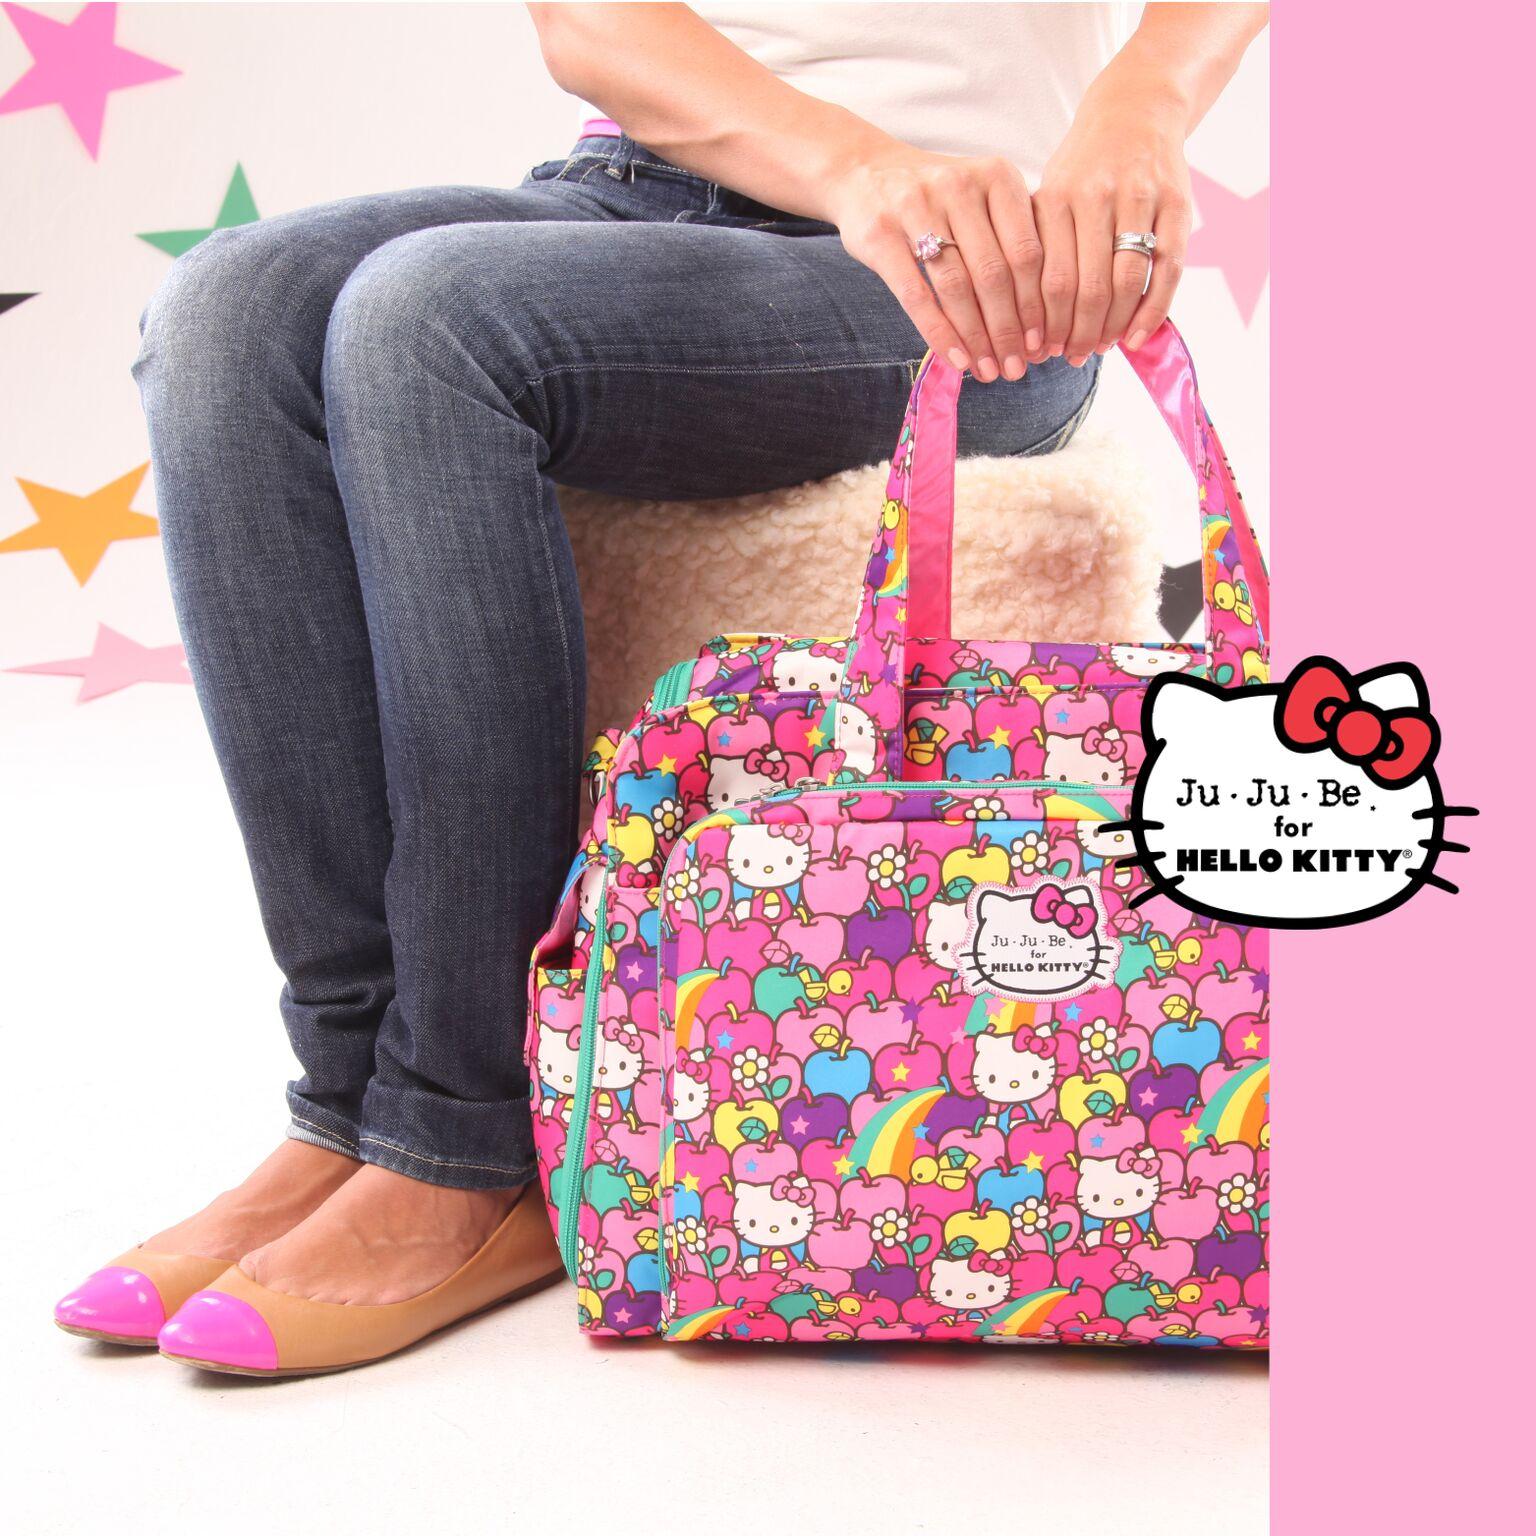 Дорожная сумка или сумка для двойни Ju-Ju-Be Be Prepared Hello kitty lucky stars